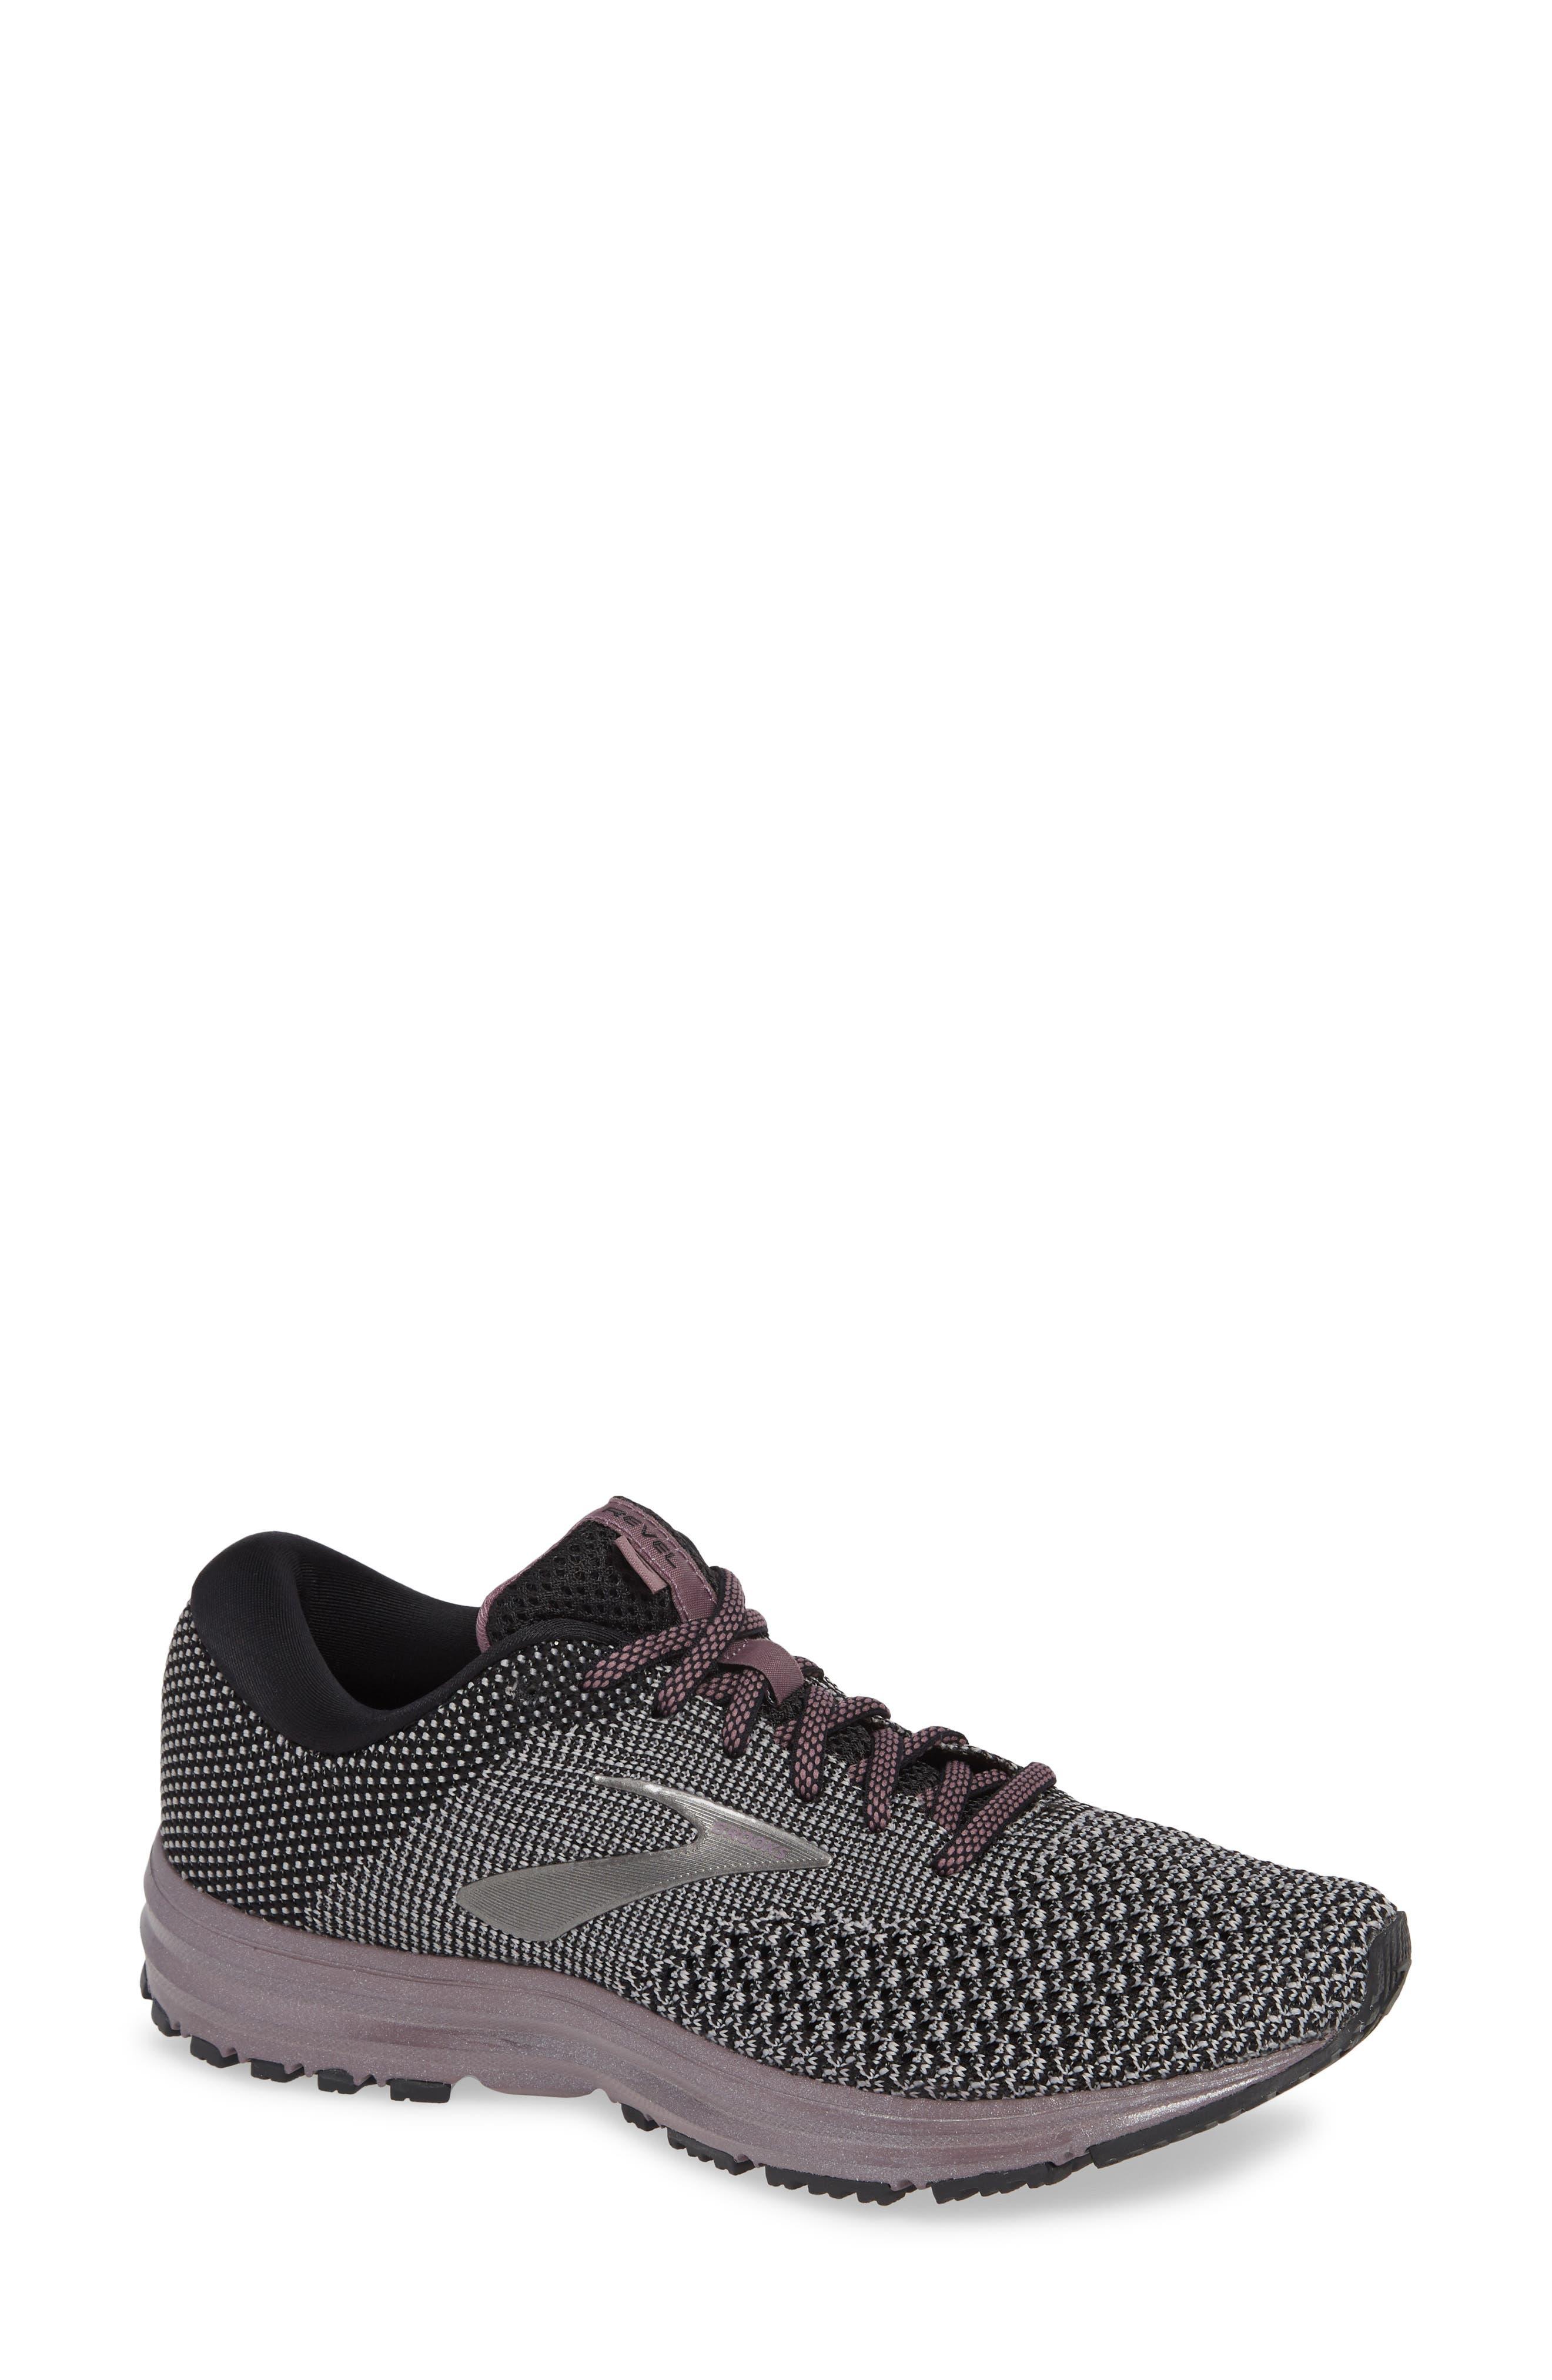 Brooks Revel 2 Running Shoe B - Black